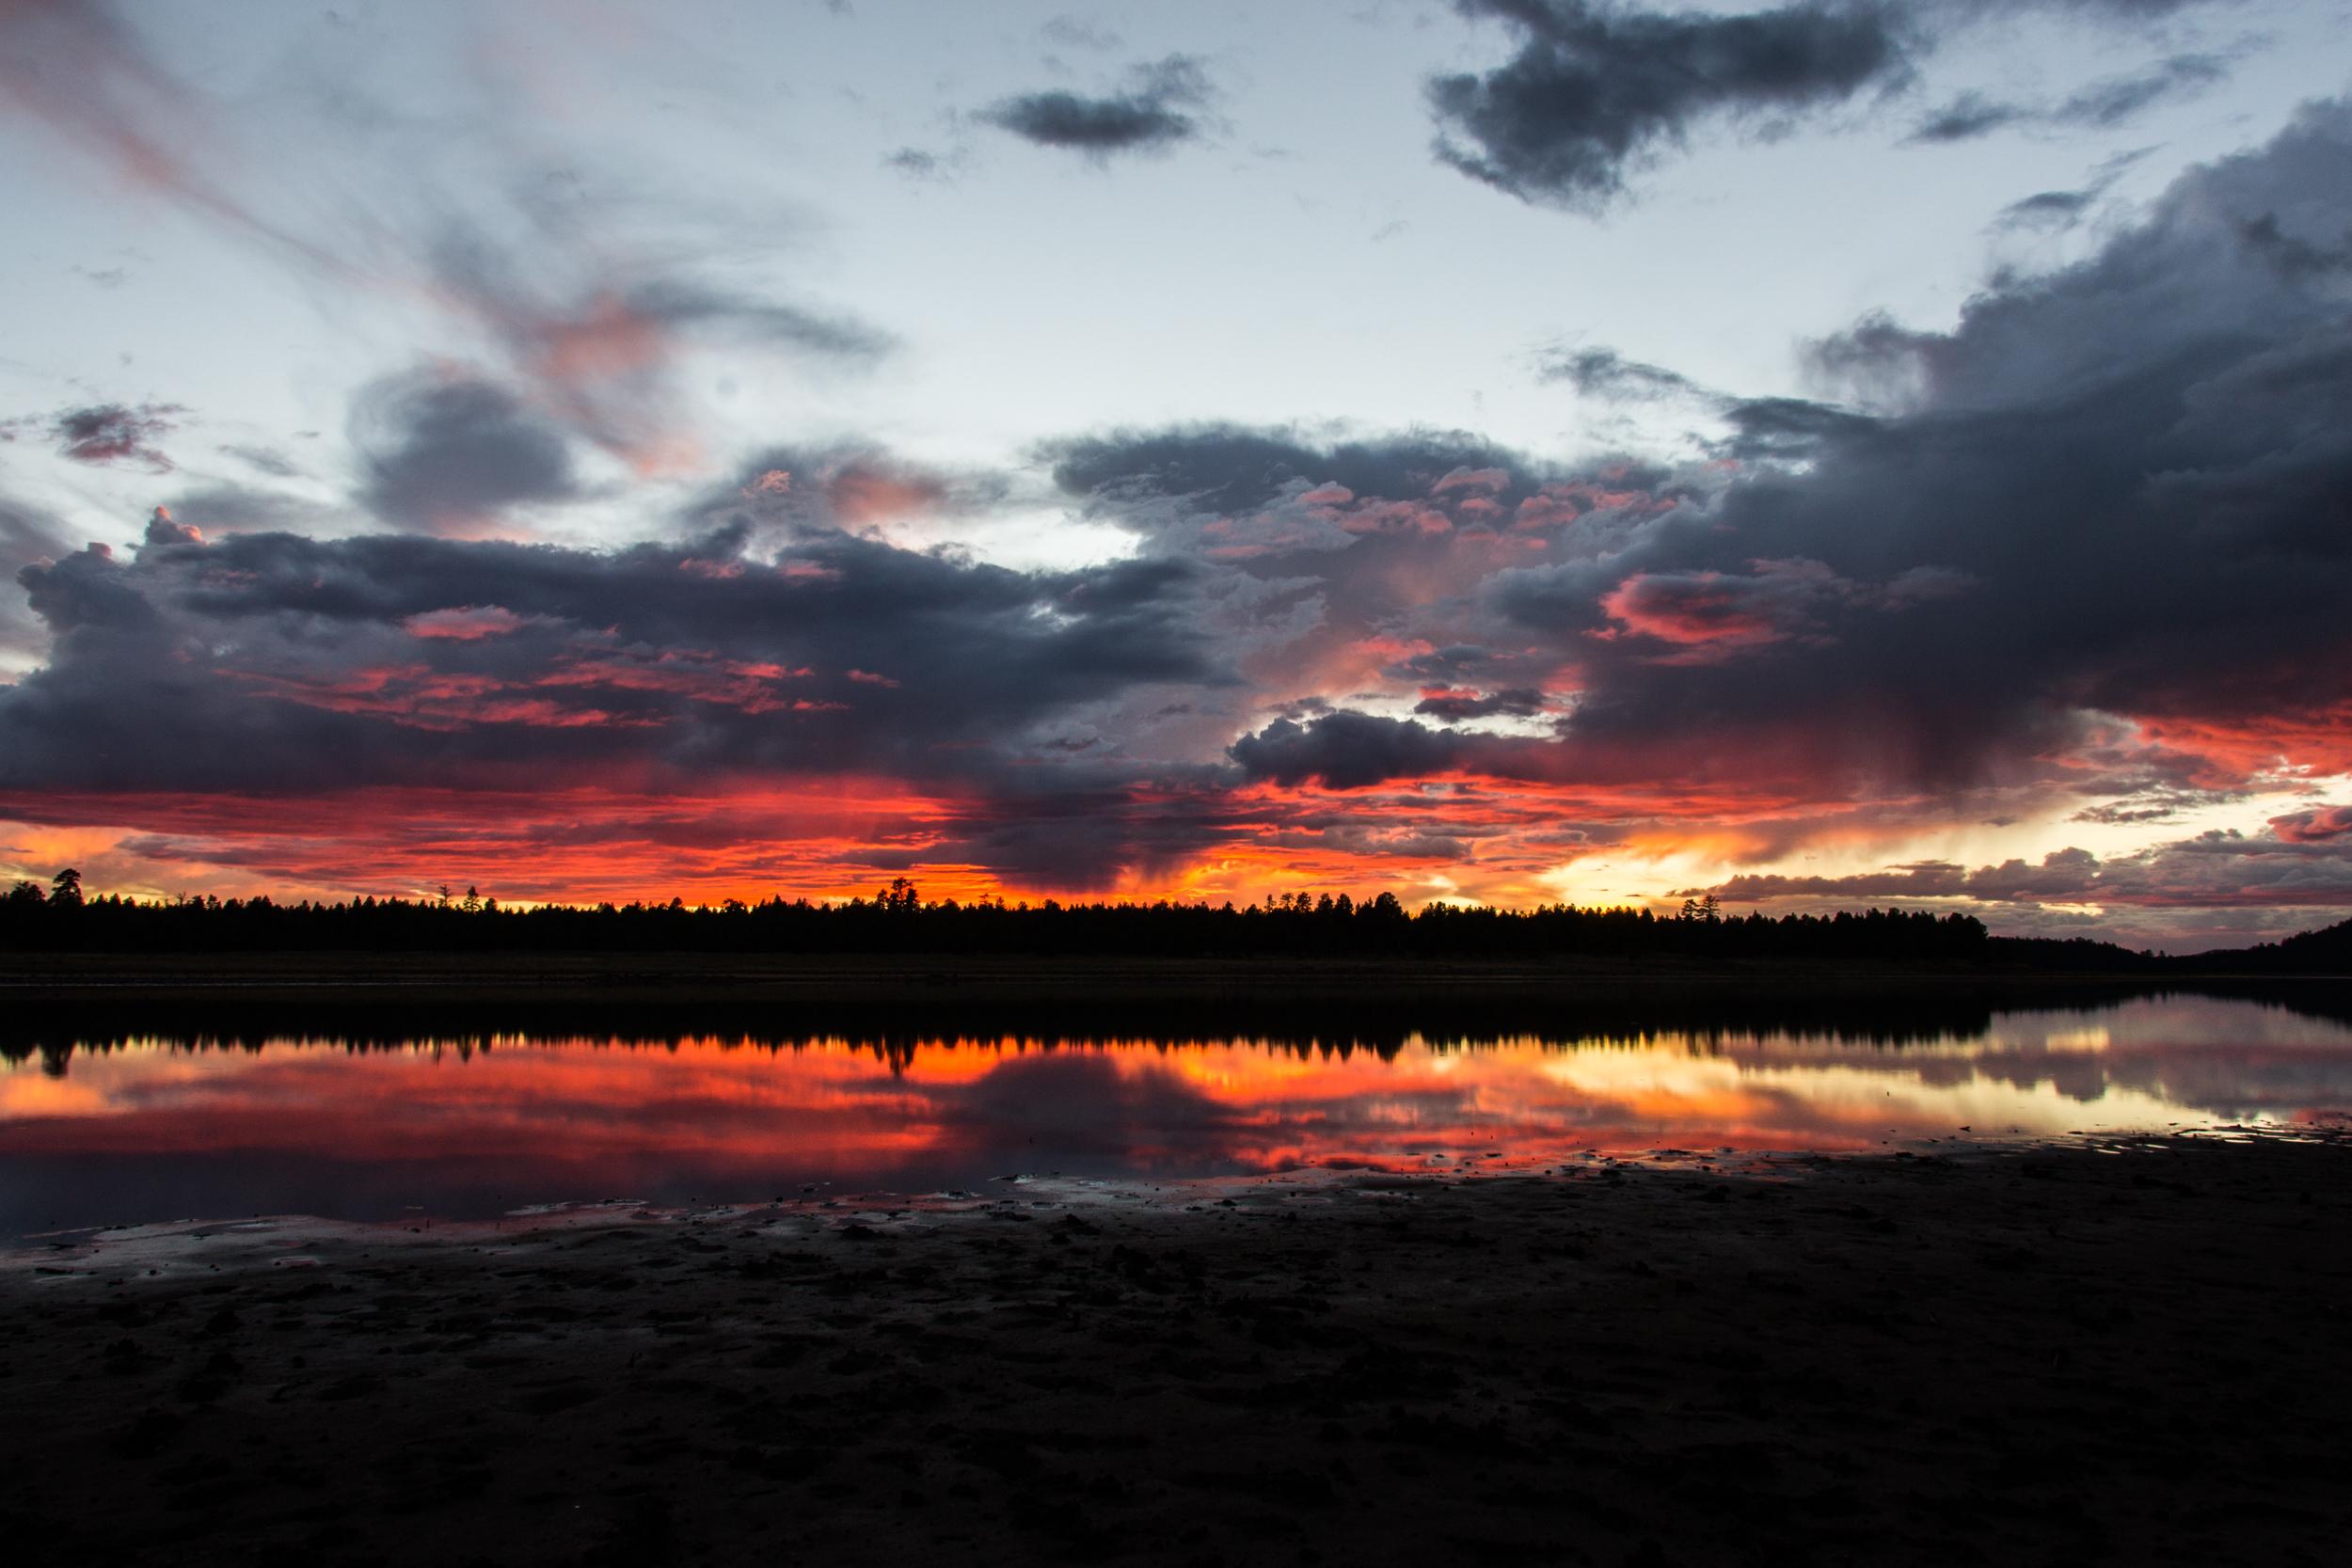 LakeMarySunset-23.jpg